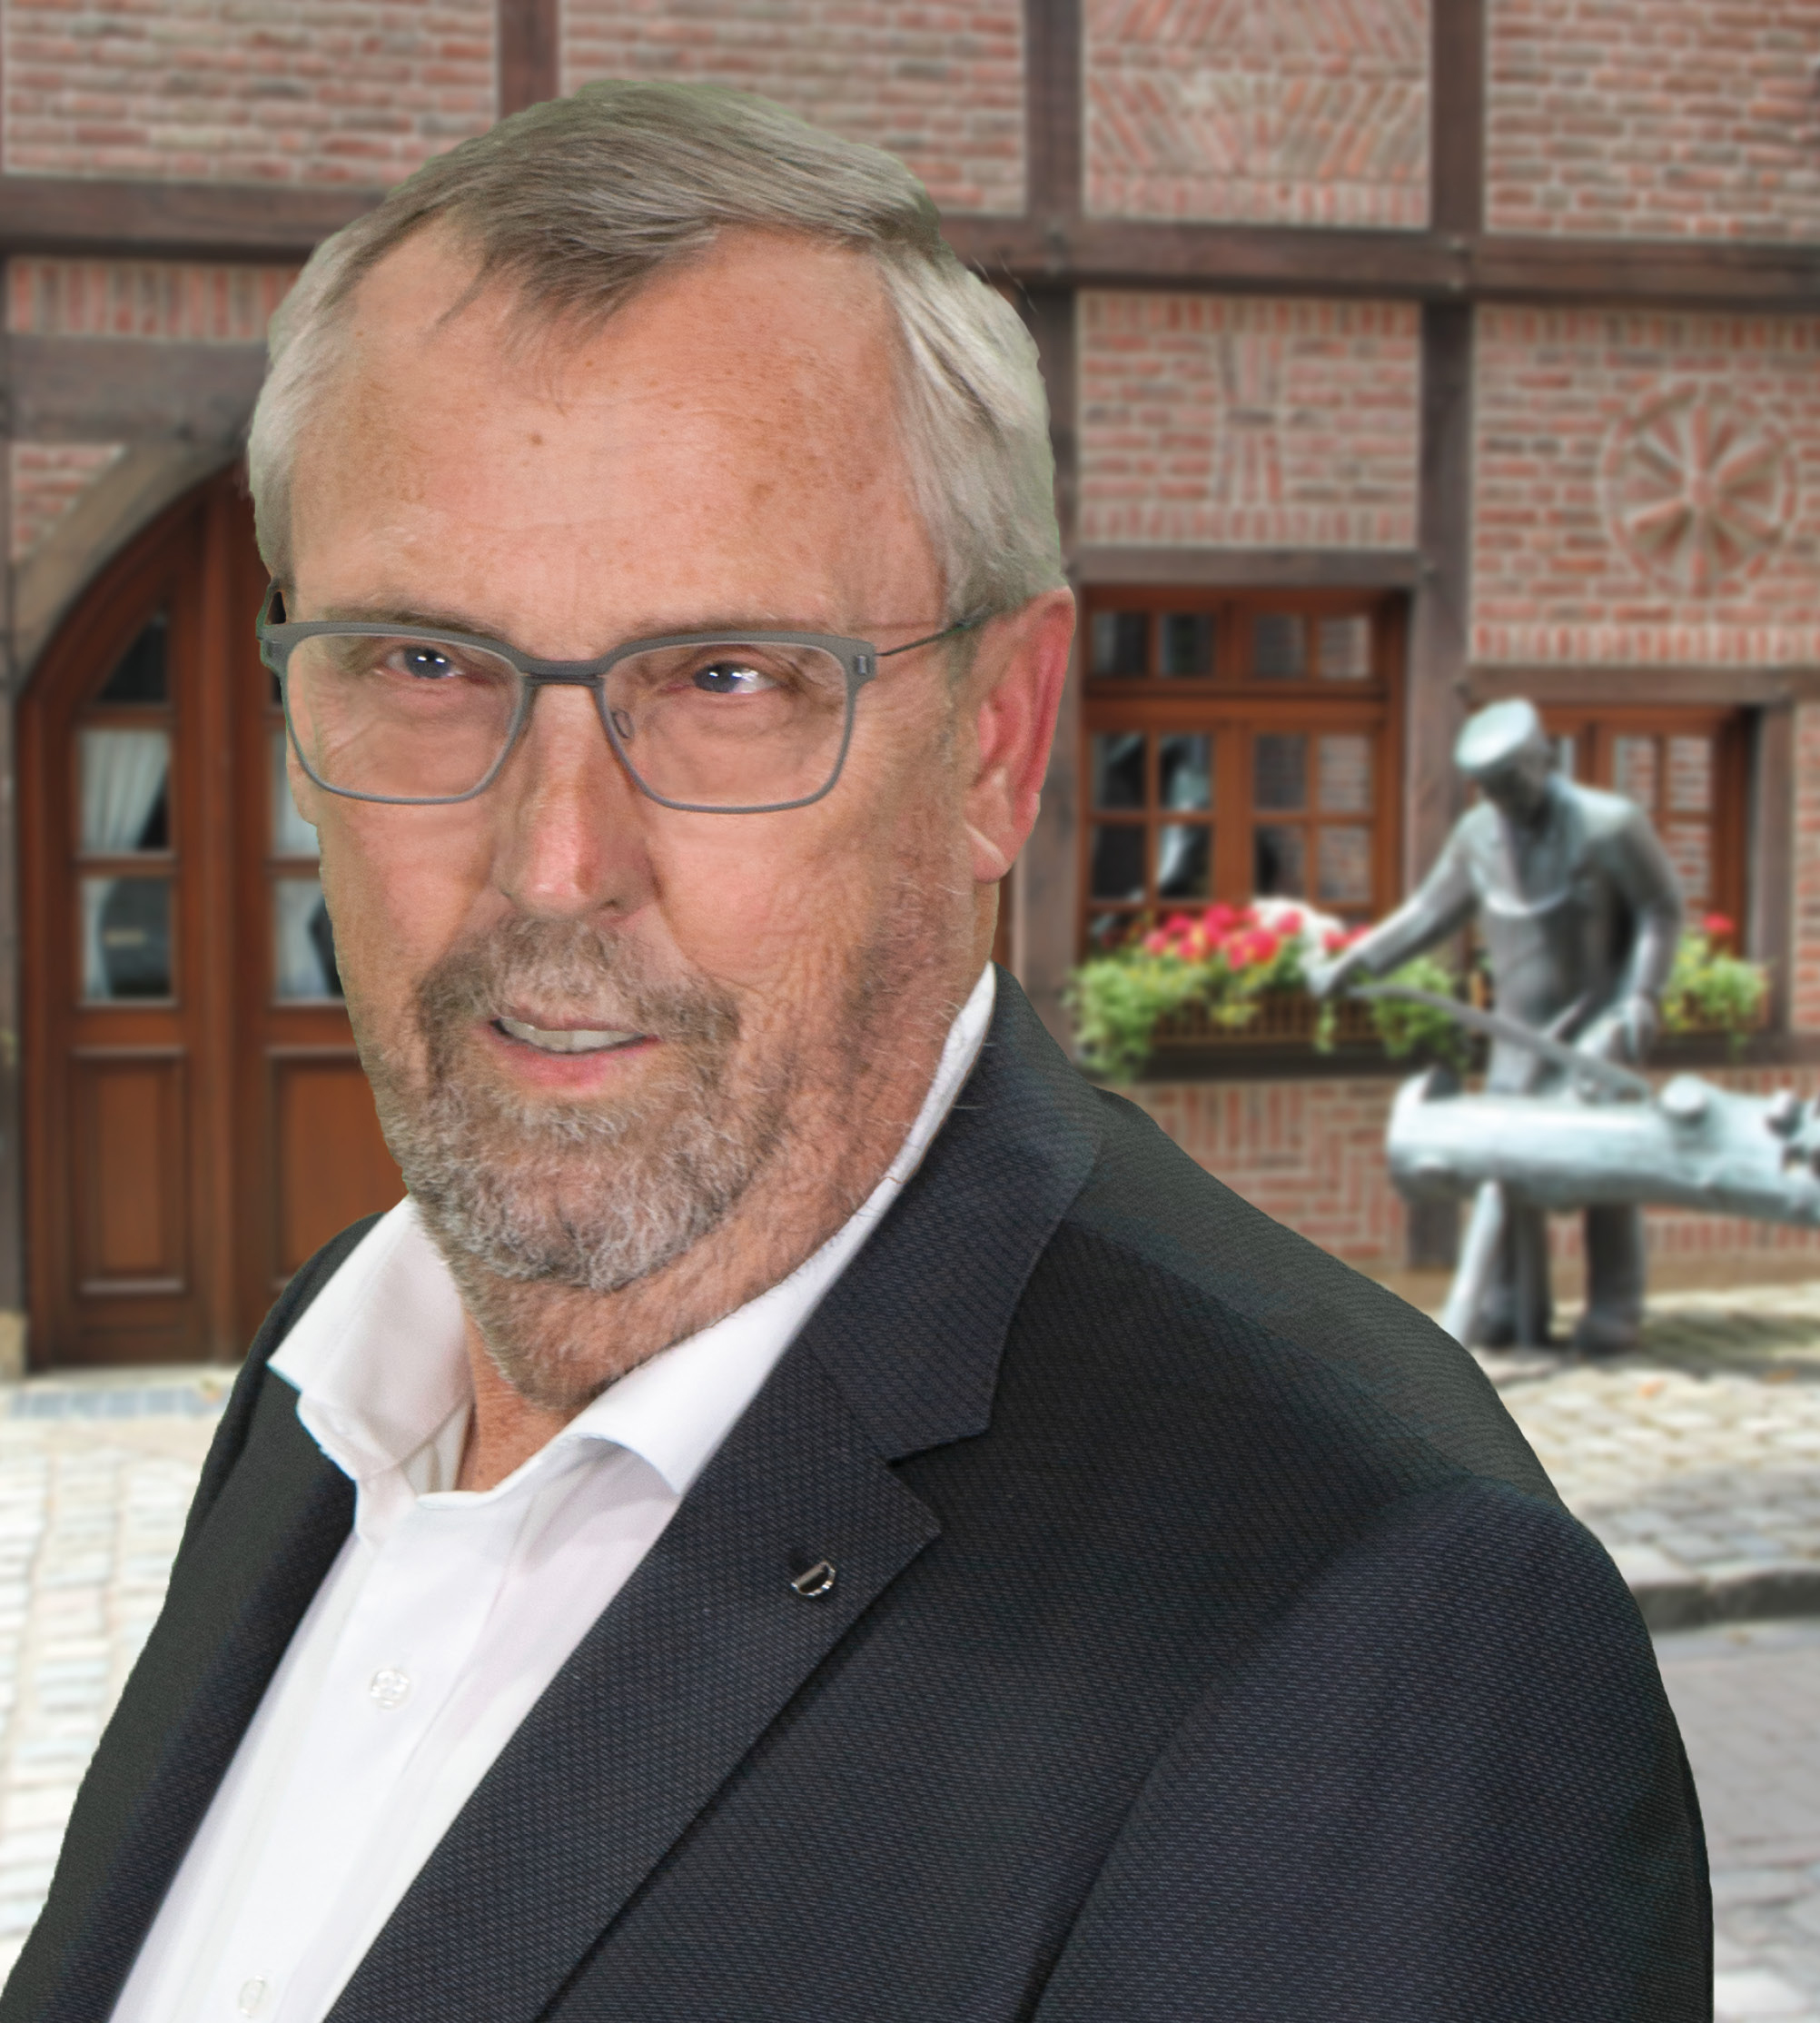 Franz Benölken